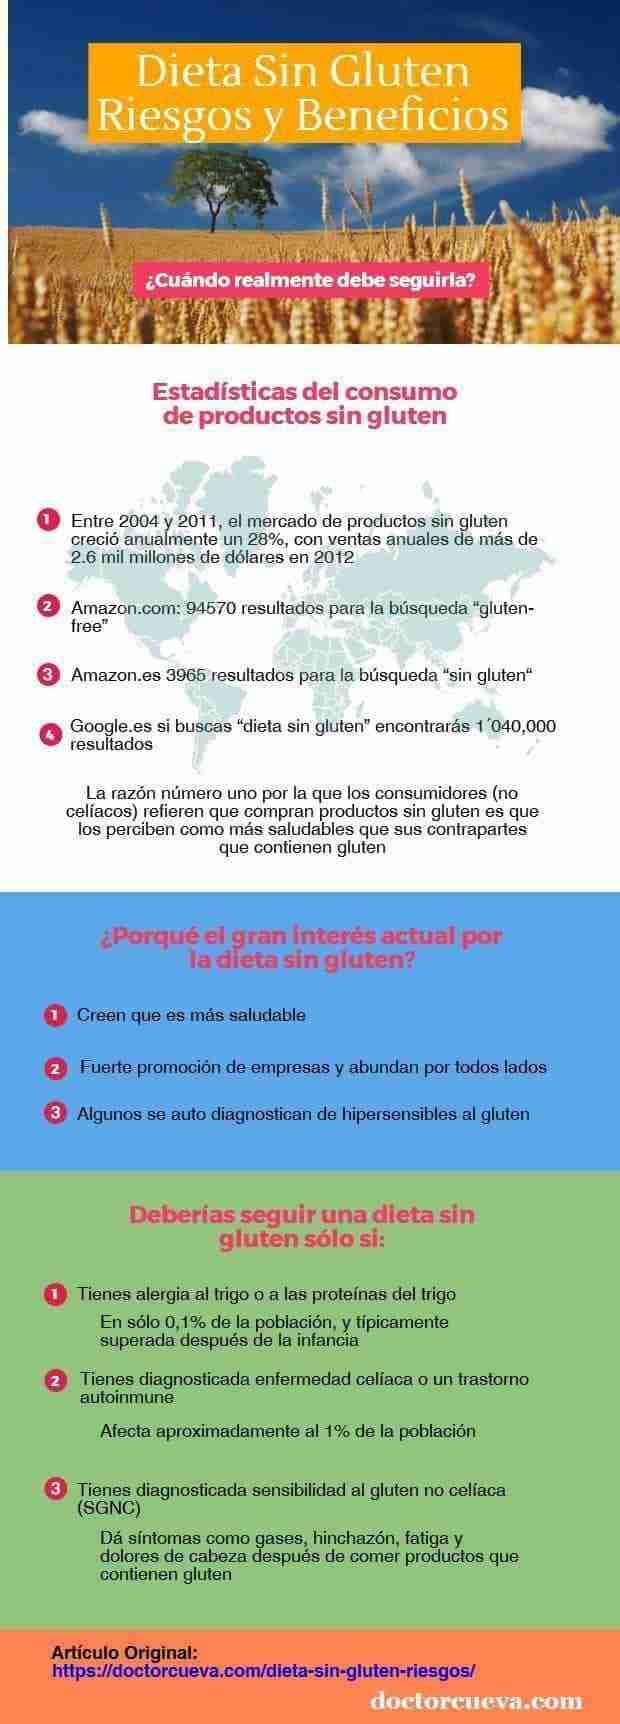 dieta sin gluten riesgos infografia